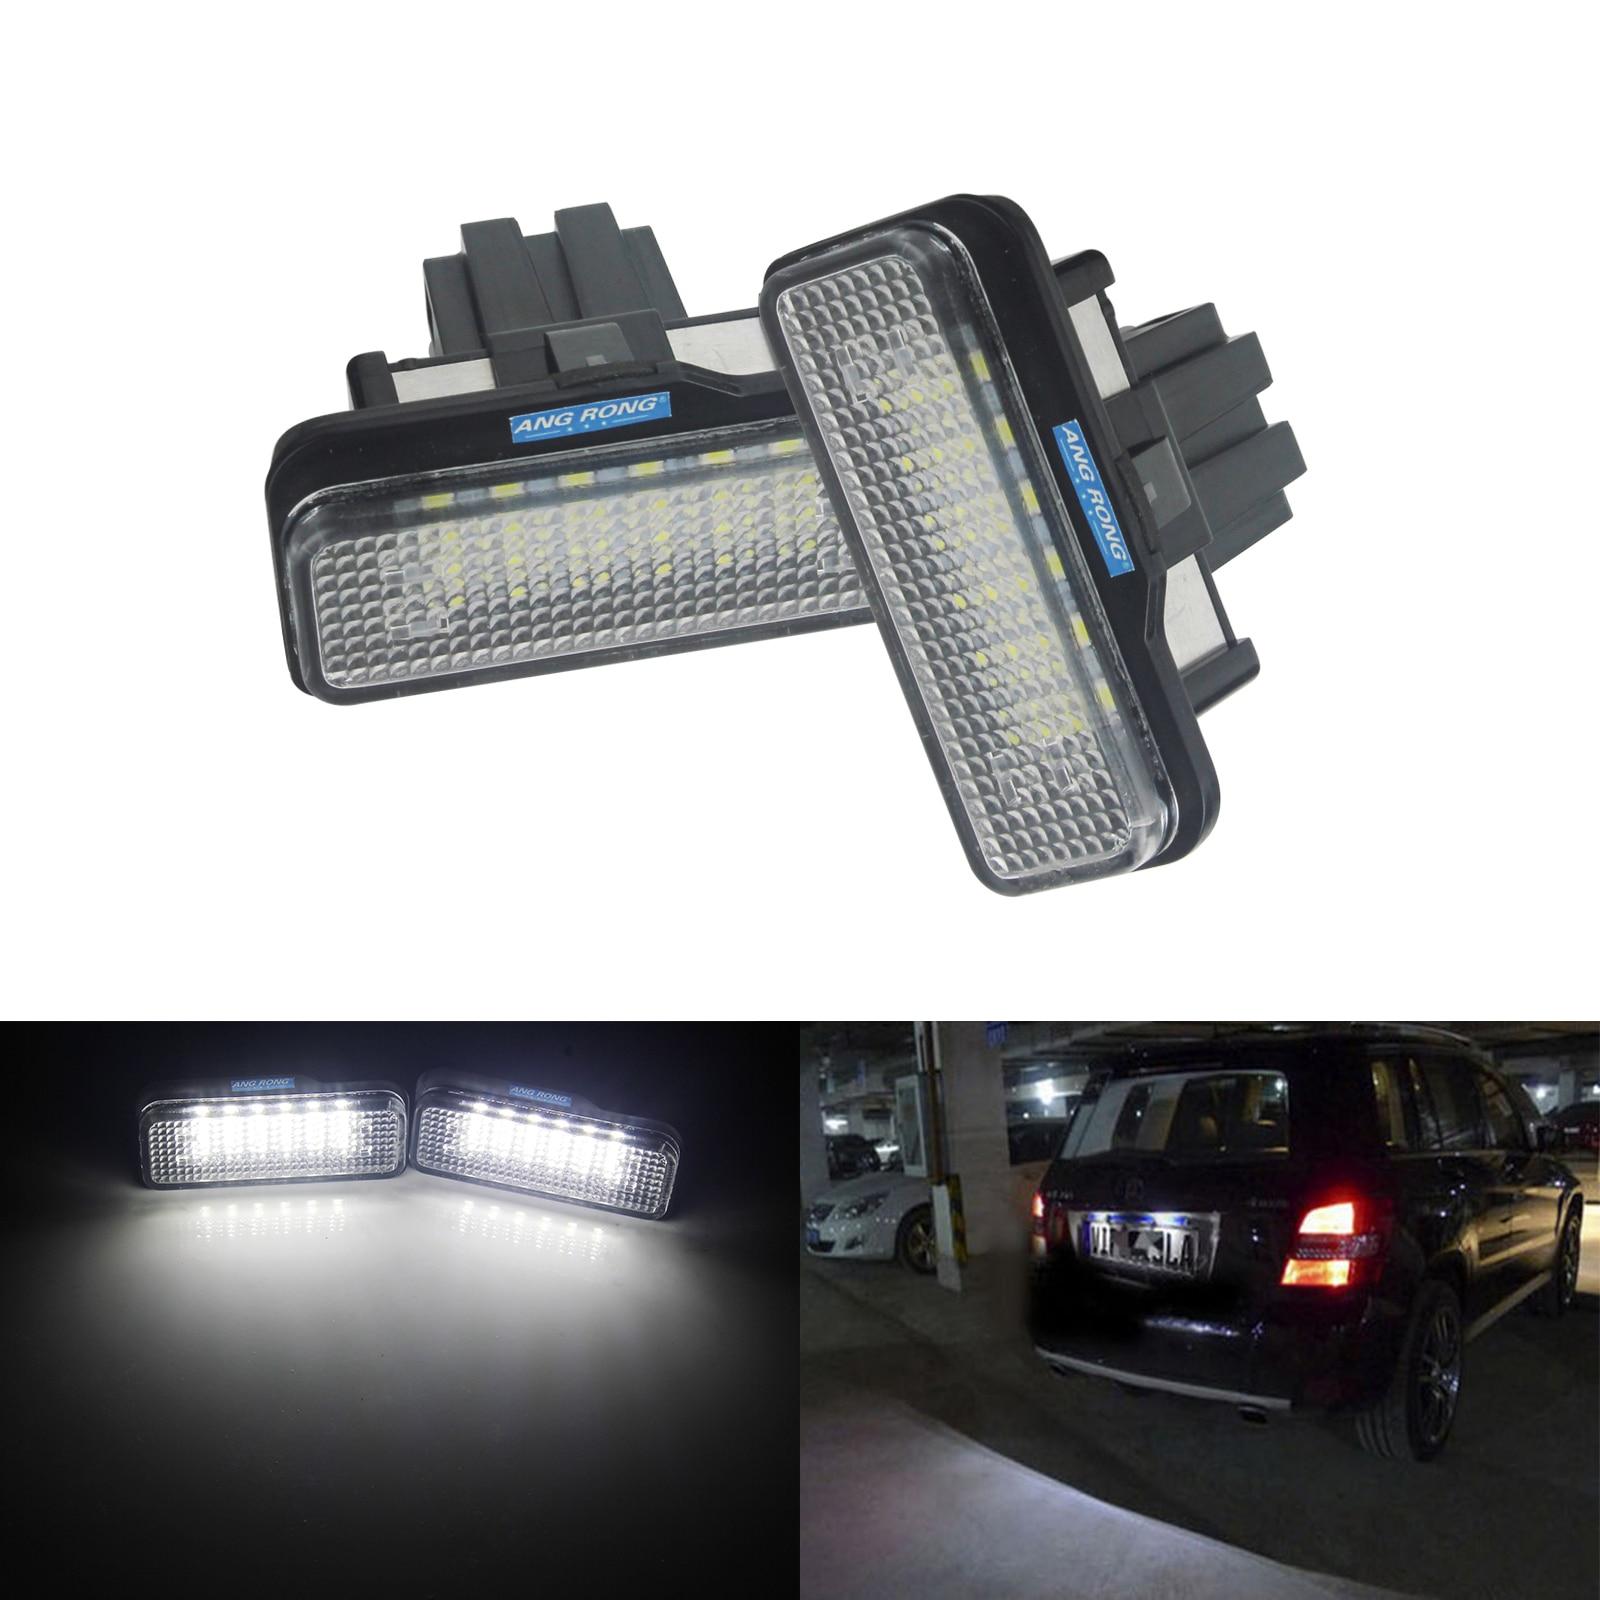 Luz de matrícula ANGRONG 2X LED para Mercedes C E CLS SLK Class S203 R171 C219 W211